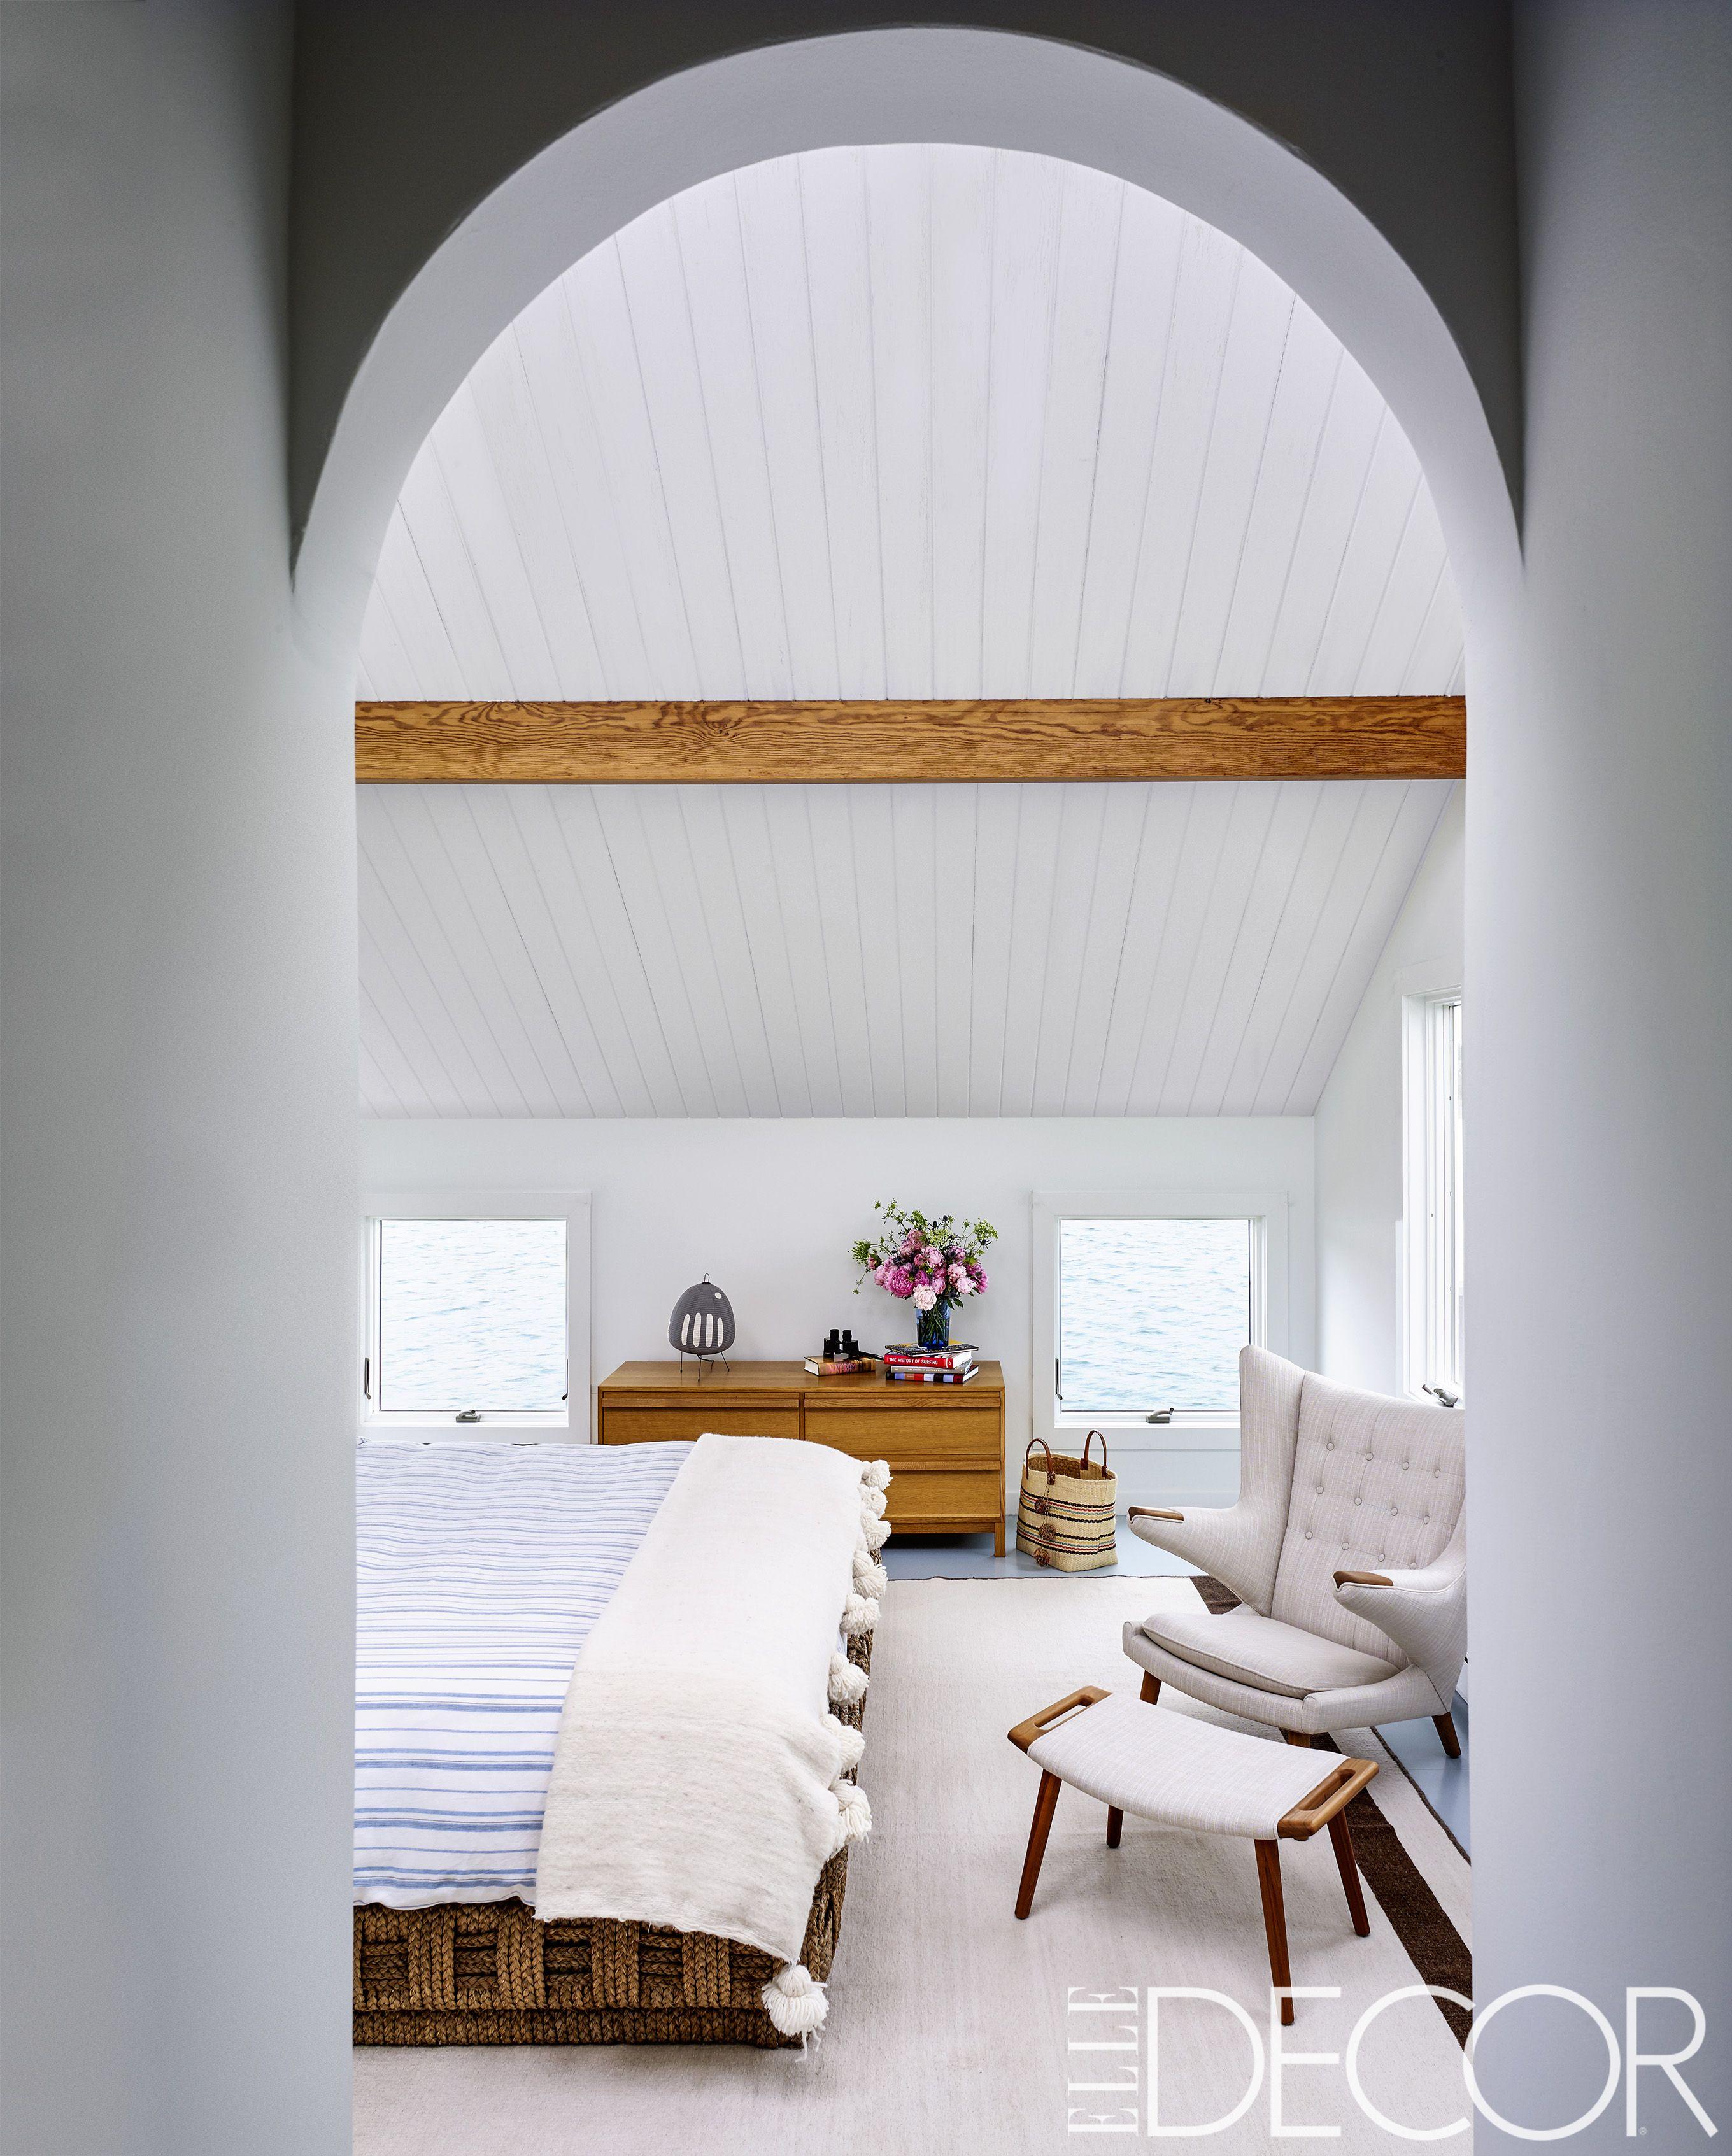 25 Minimalist Bedroom Decor Ideas - Modern Designs for ... on Minimalist Bedroom Design Ideas  id=62436